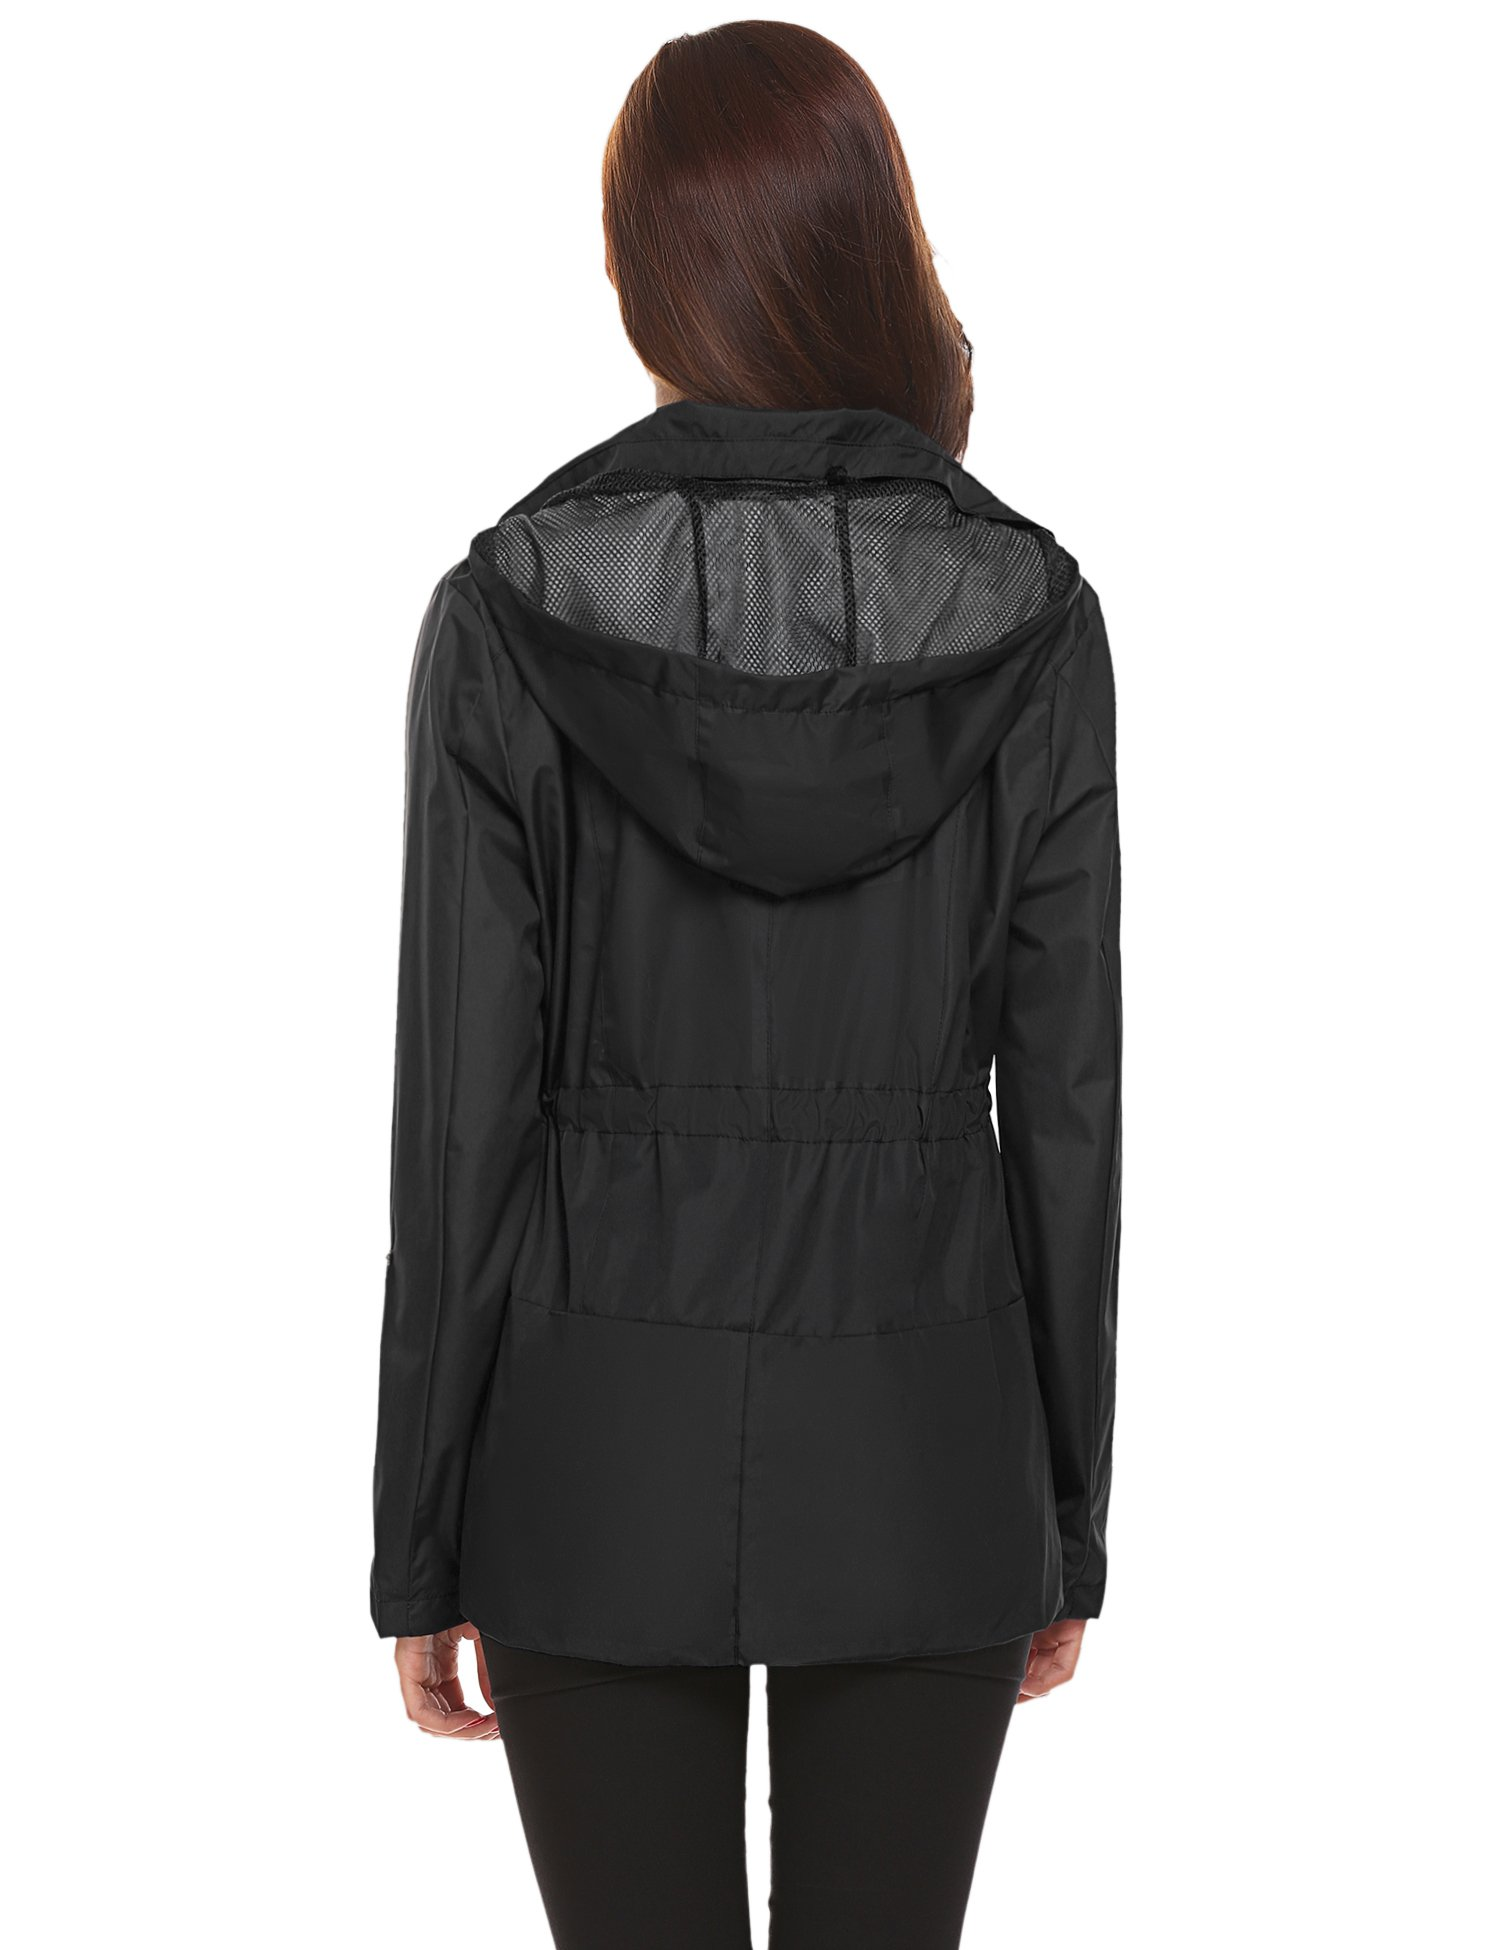 Romanstii Outdoor Jacket Women,Waterproof Raincoat with Hood Active for Camping Hiking 2X by Romanstii (Image #3)